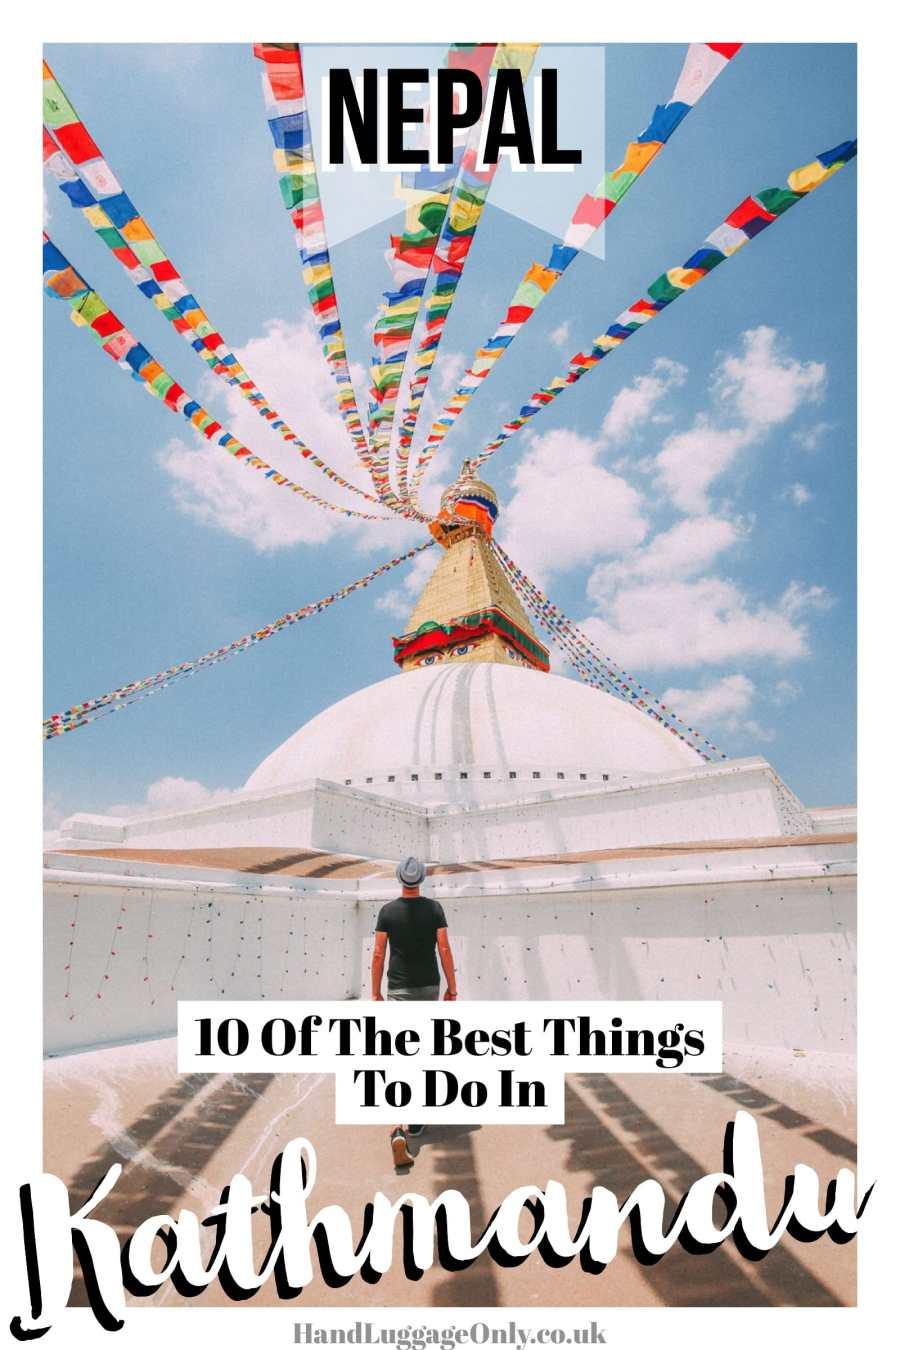 10 Of The Best Things To Do In Kathmandu, Nepal (21)